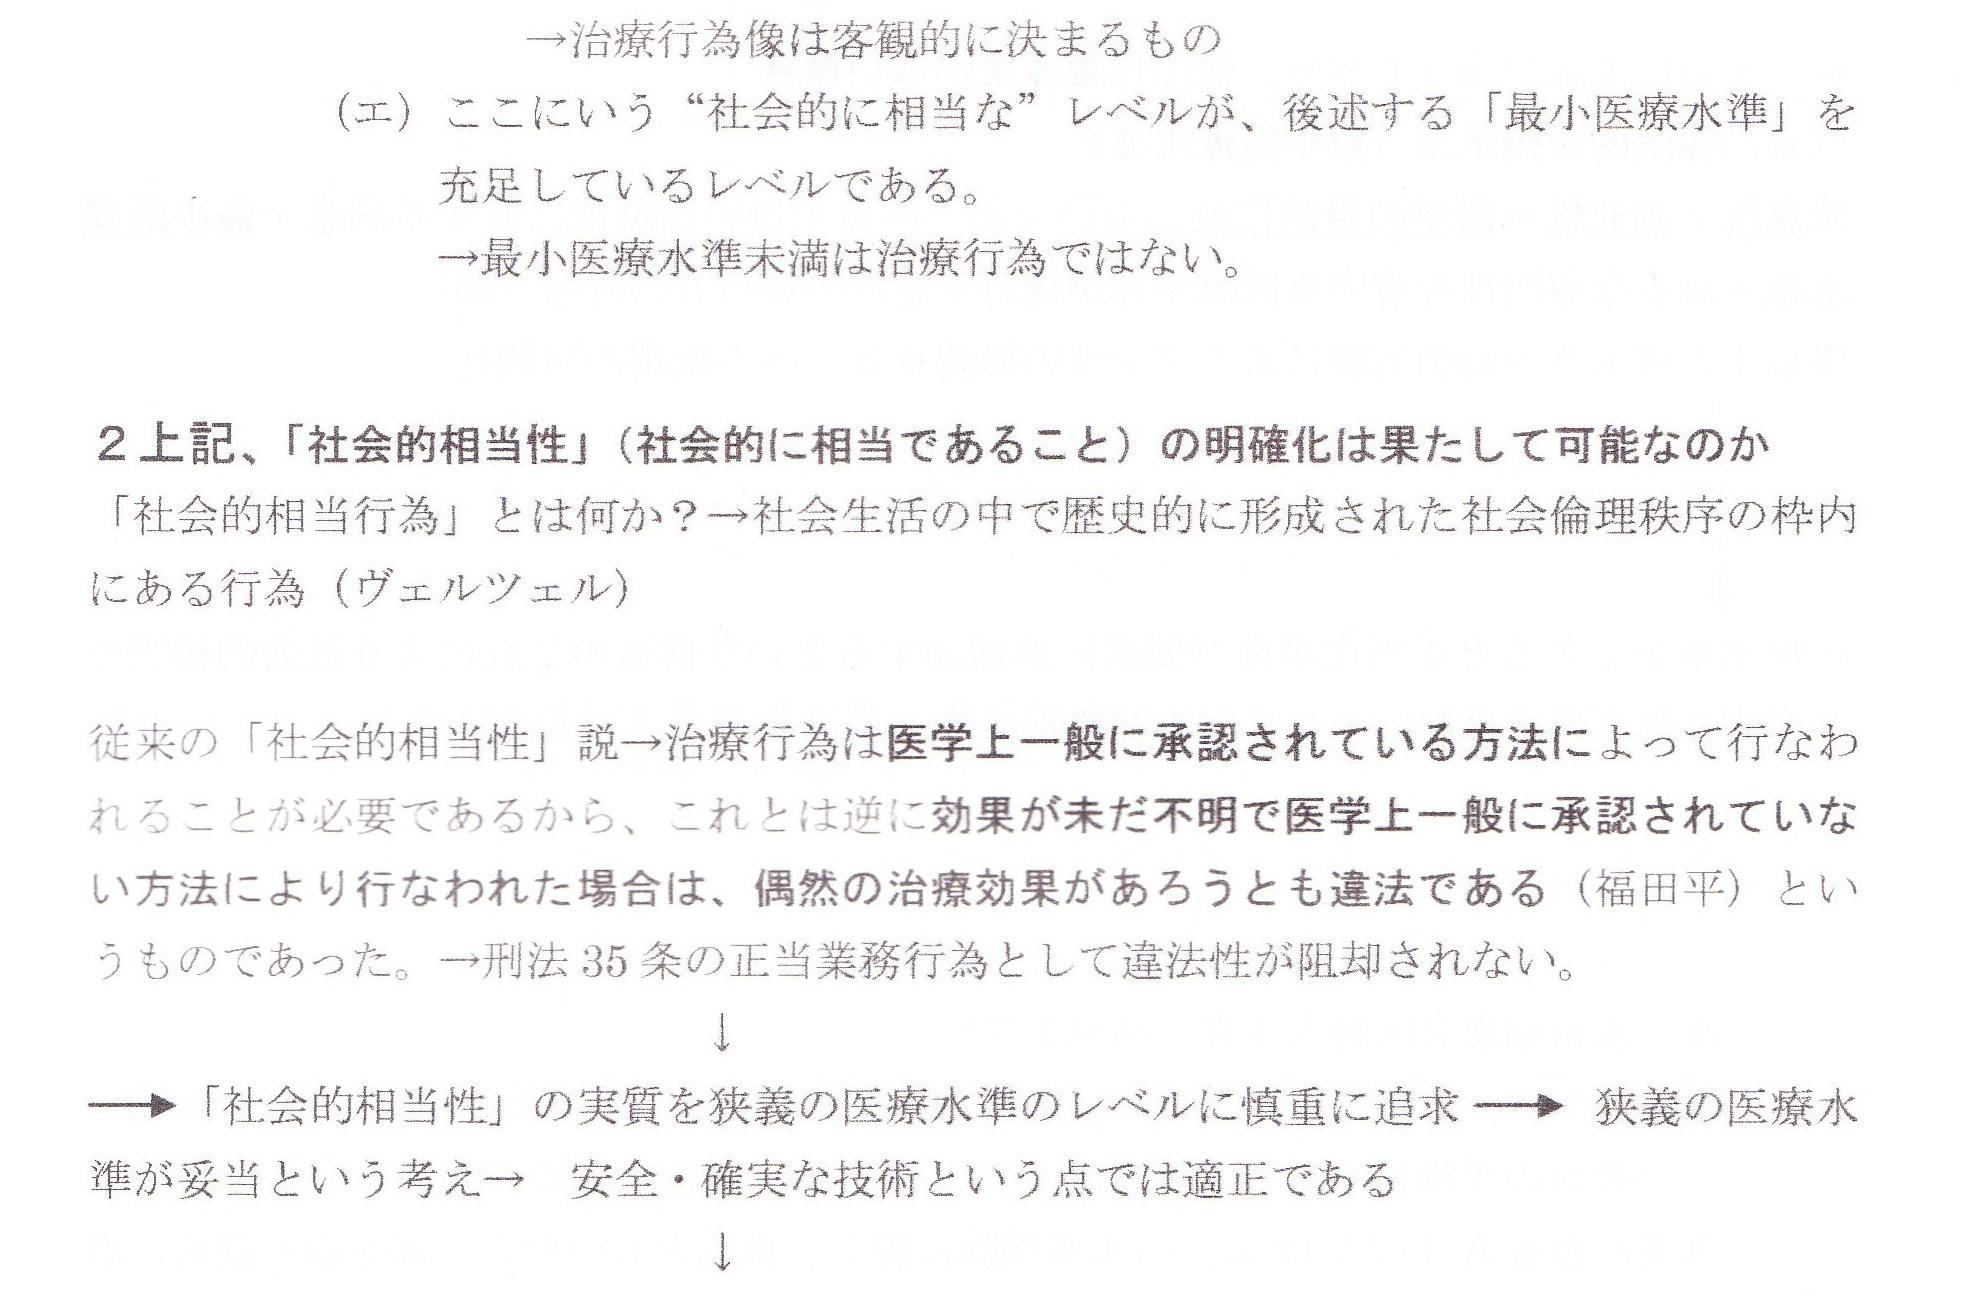 22.5.30NPO法人・第2回総会・記念講演会_e0163726_1533020.jpg